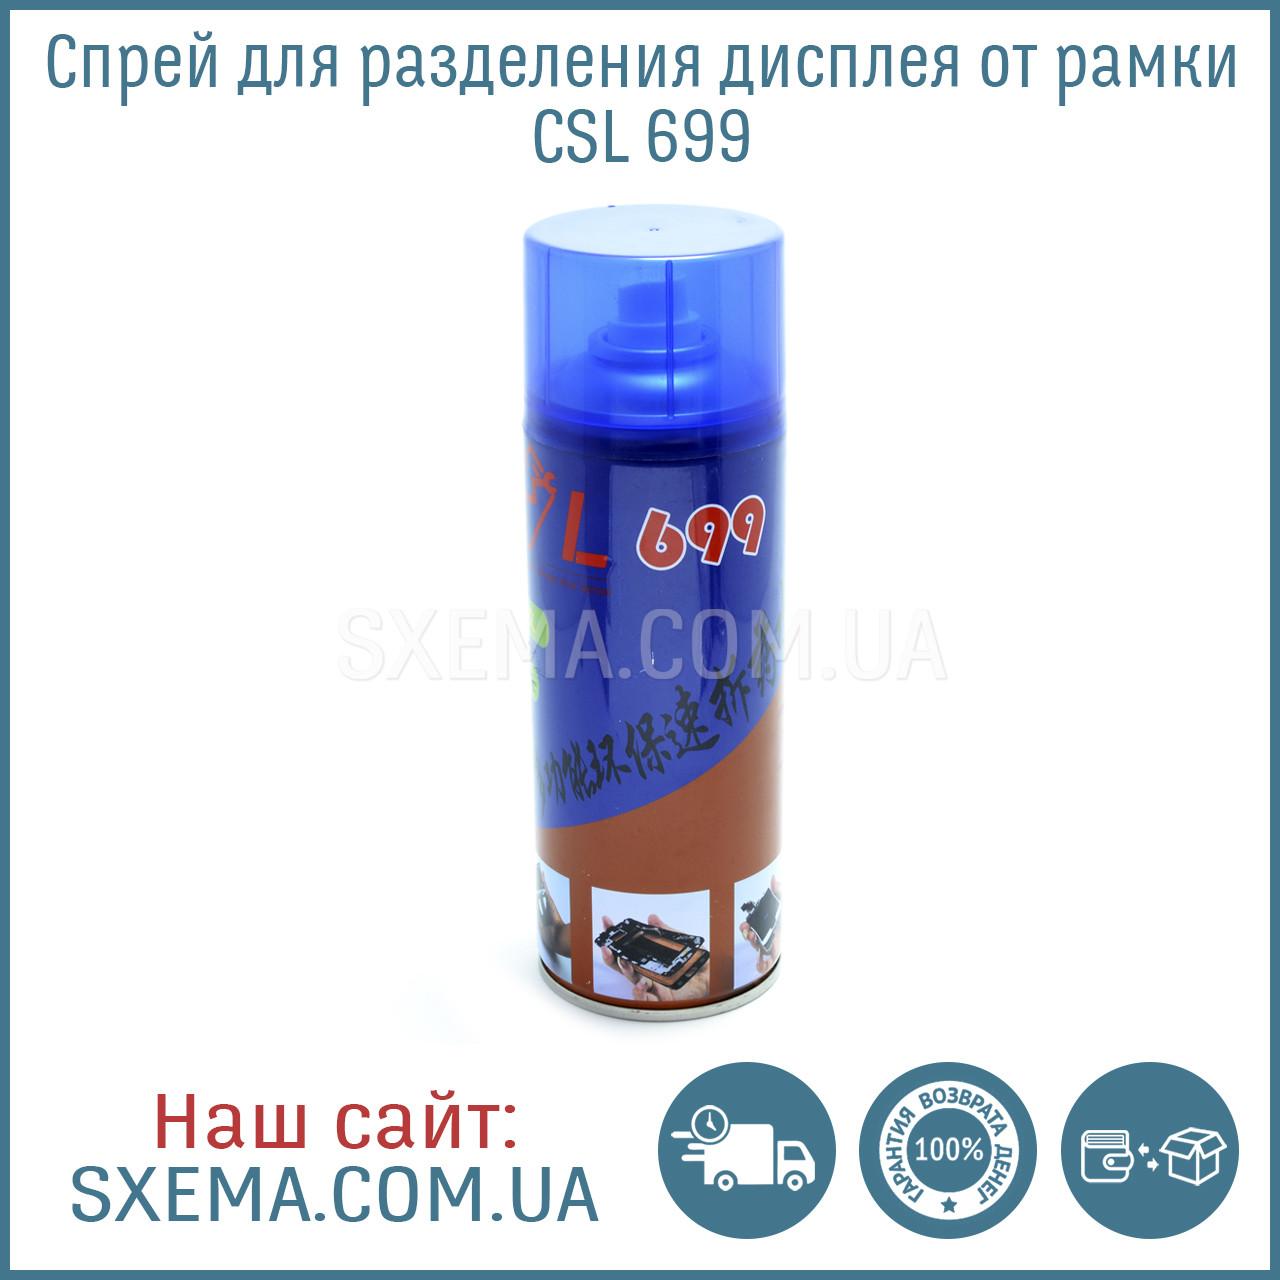 Спрей для разделения дисплея от рамки KSL 699 400мл